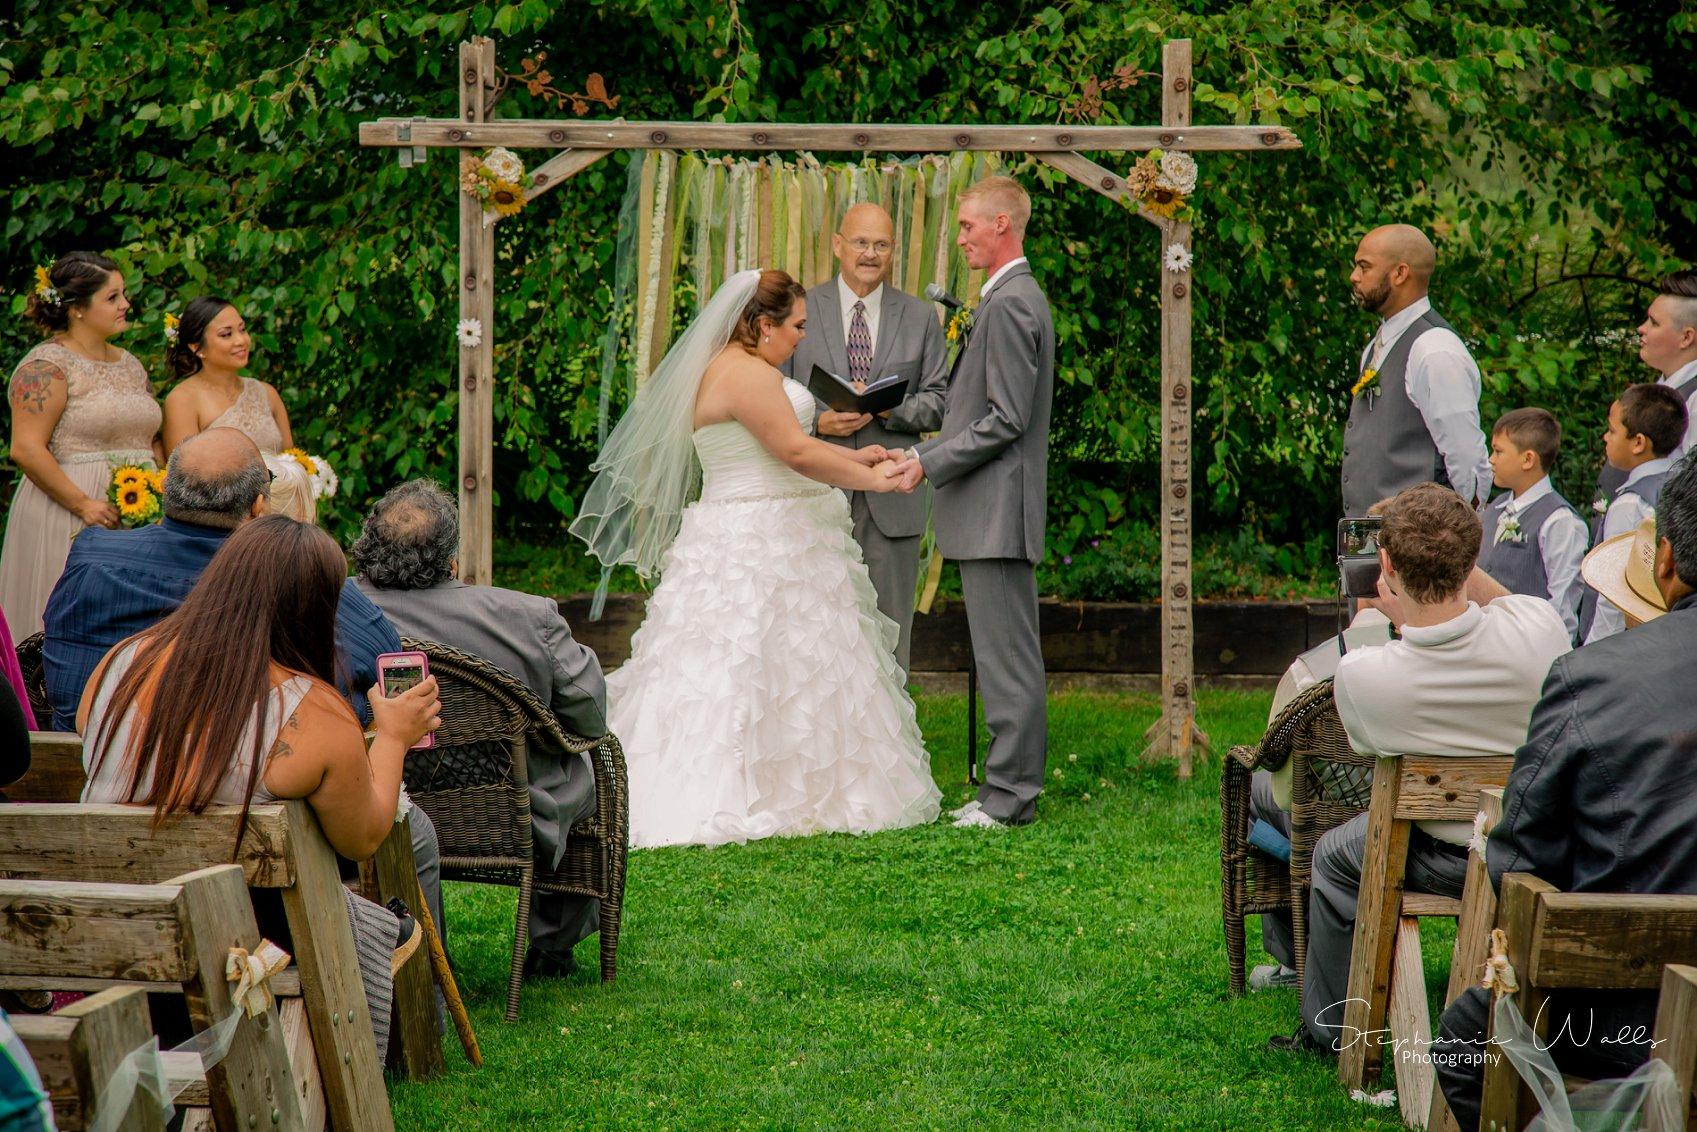 Kimble Wedding 191 Marlena & Allans | Snohomish Red Barn Events (Stocker Farms) | Snohomish, Wa Wedding Photographer